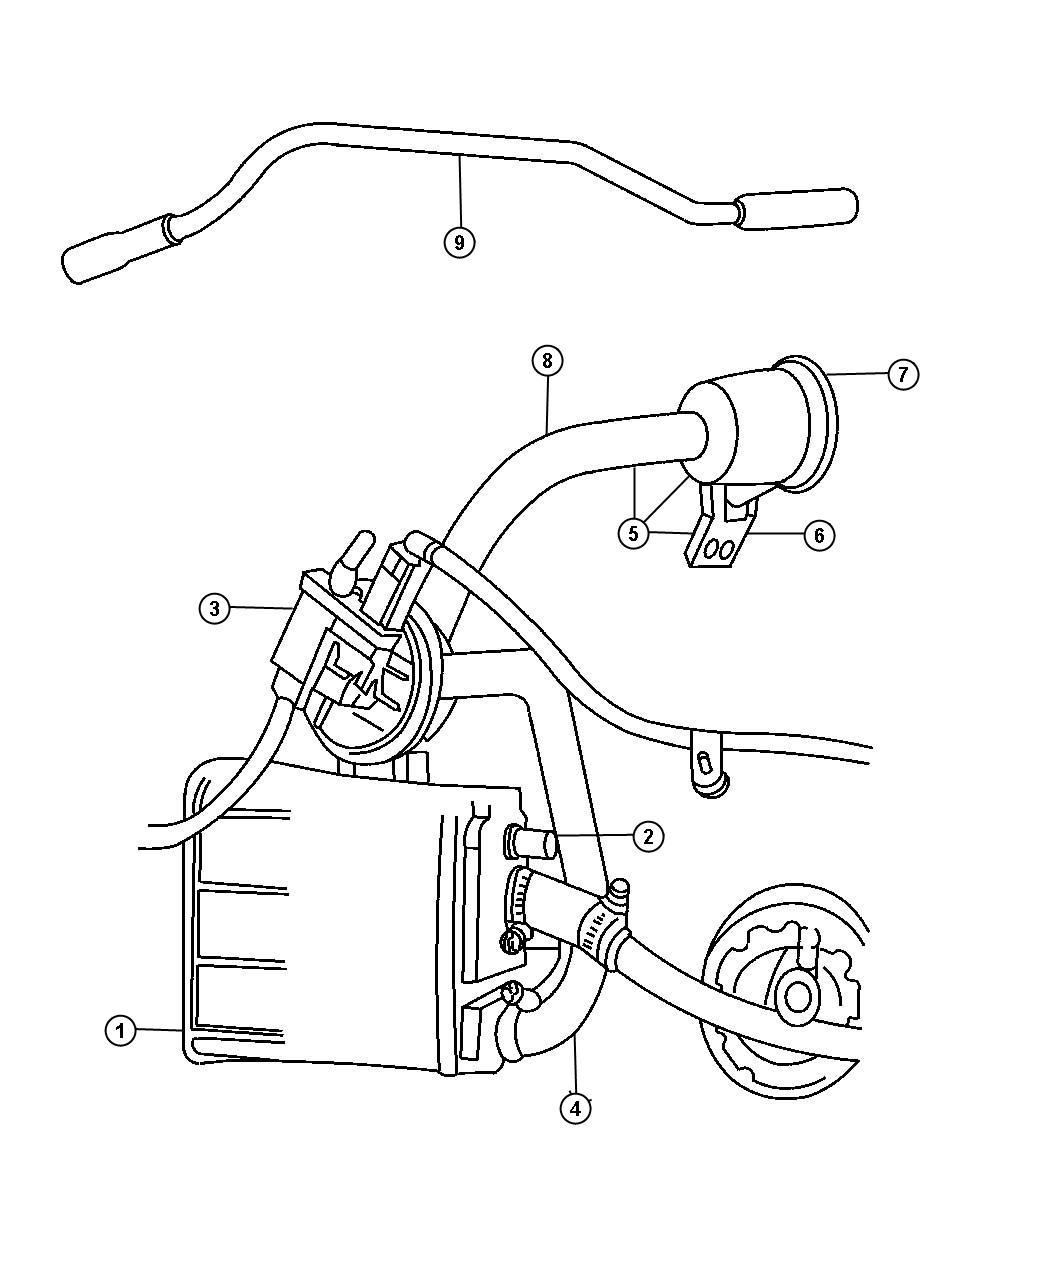 Dodge Nitro Pump Leak Detection Emissions Canister